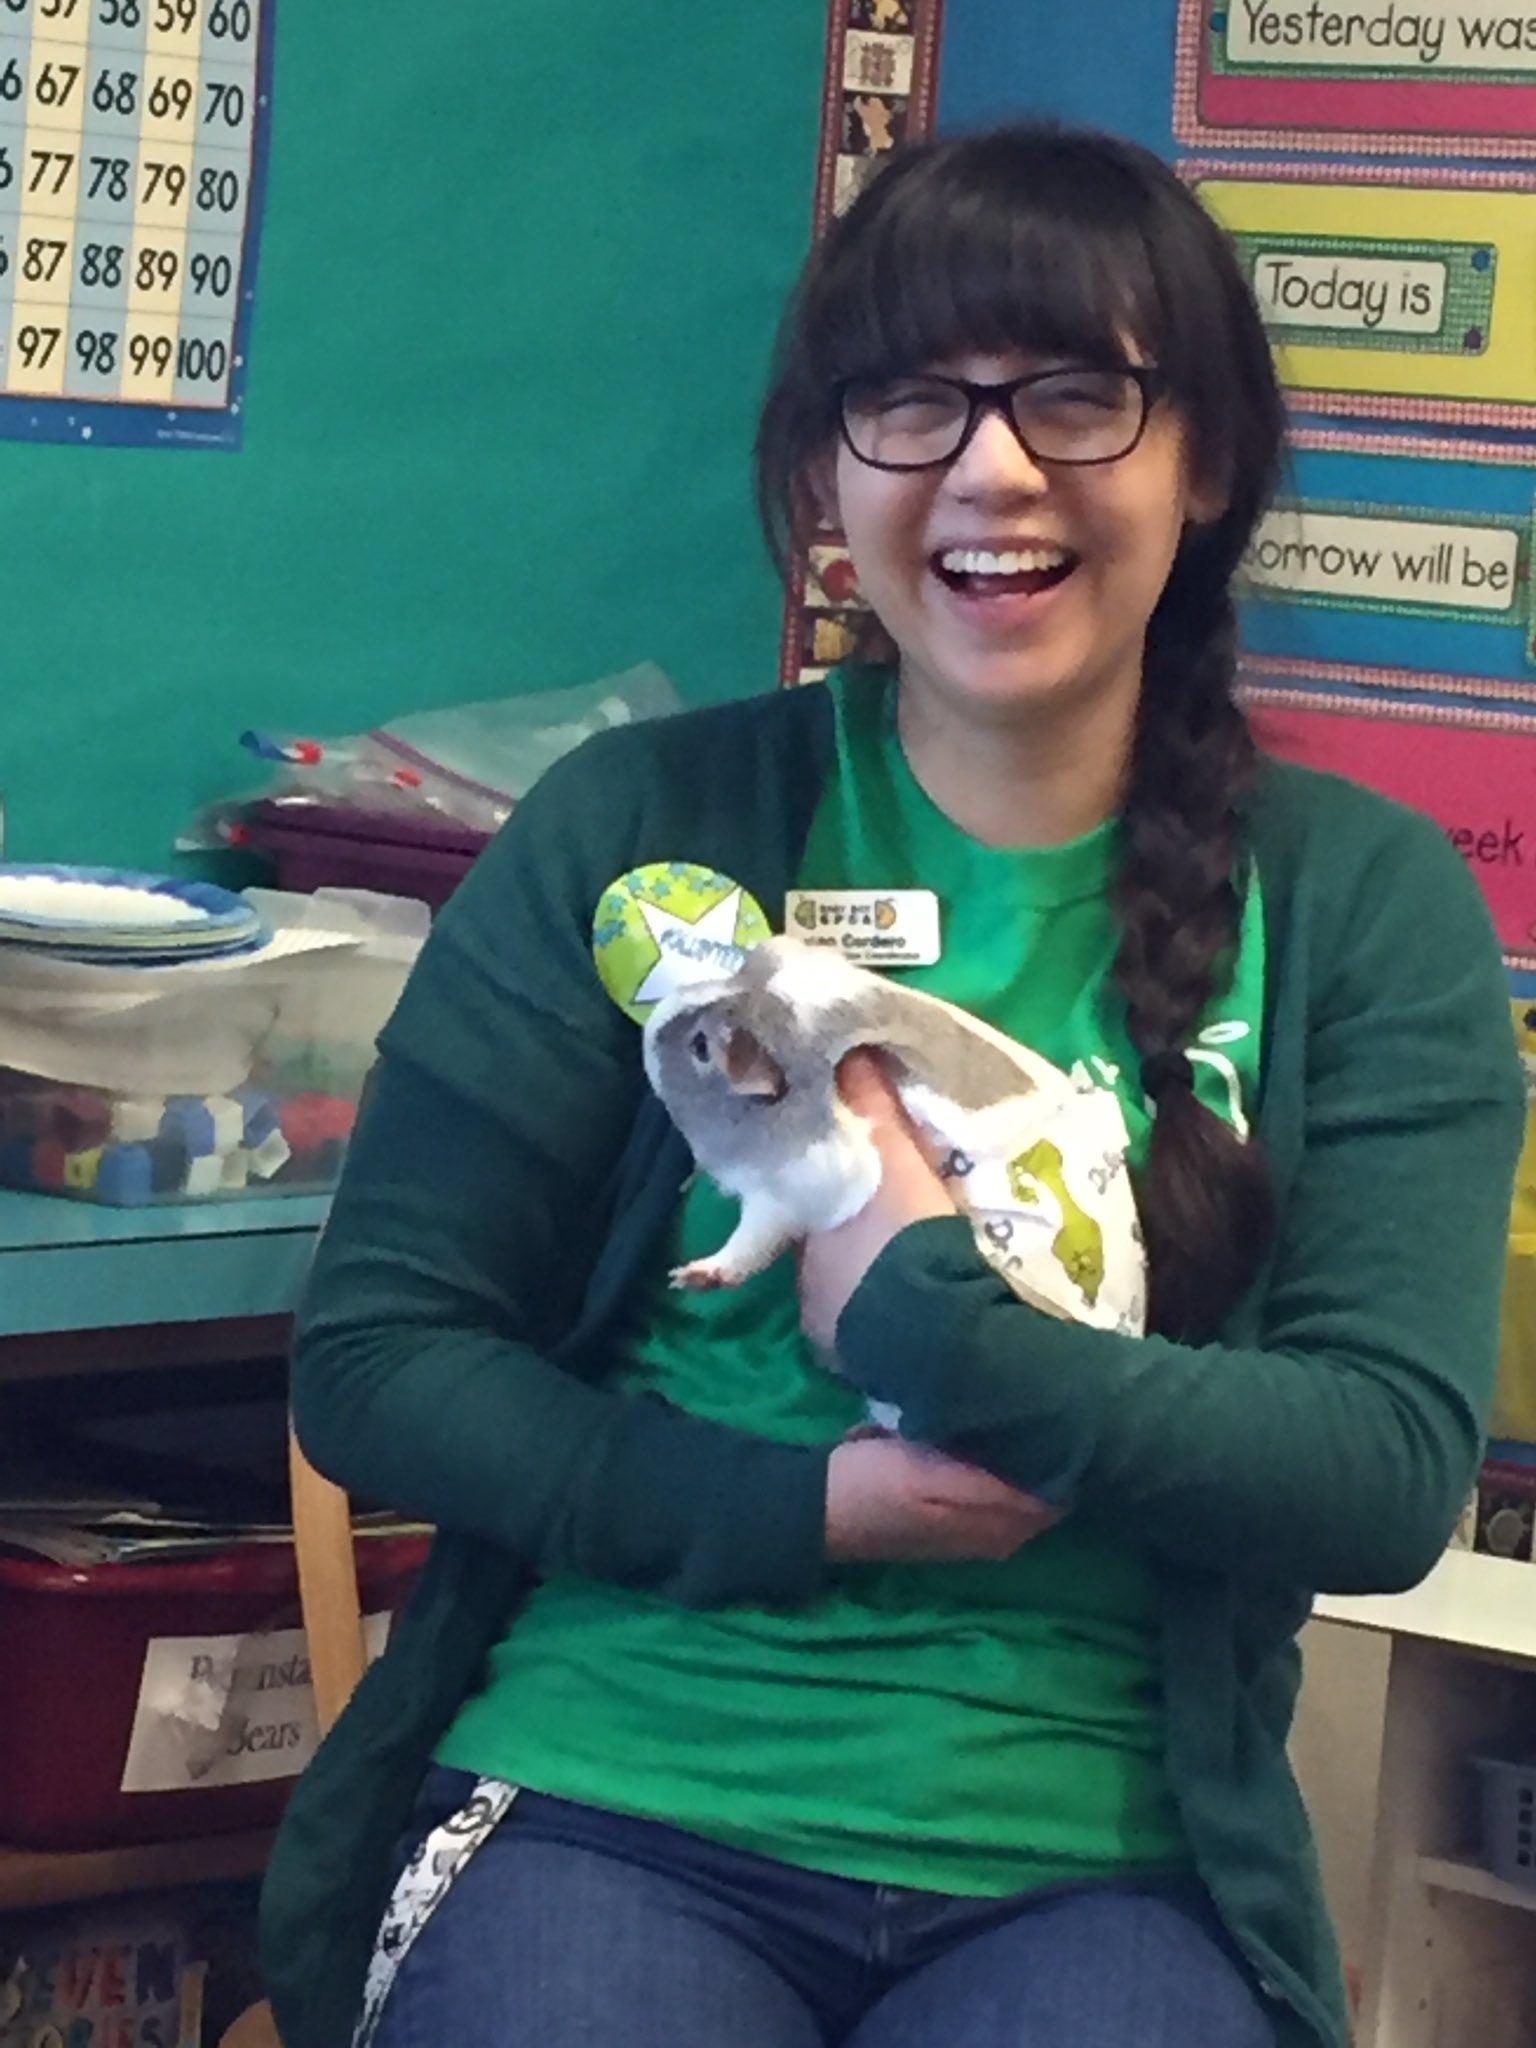 A guinea pig from the SPCA helped us celebrate #ReadAcrossAmerica @FredPrincipal @DUSD4kids https://t.co/rQ3W9kCxah